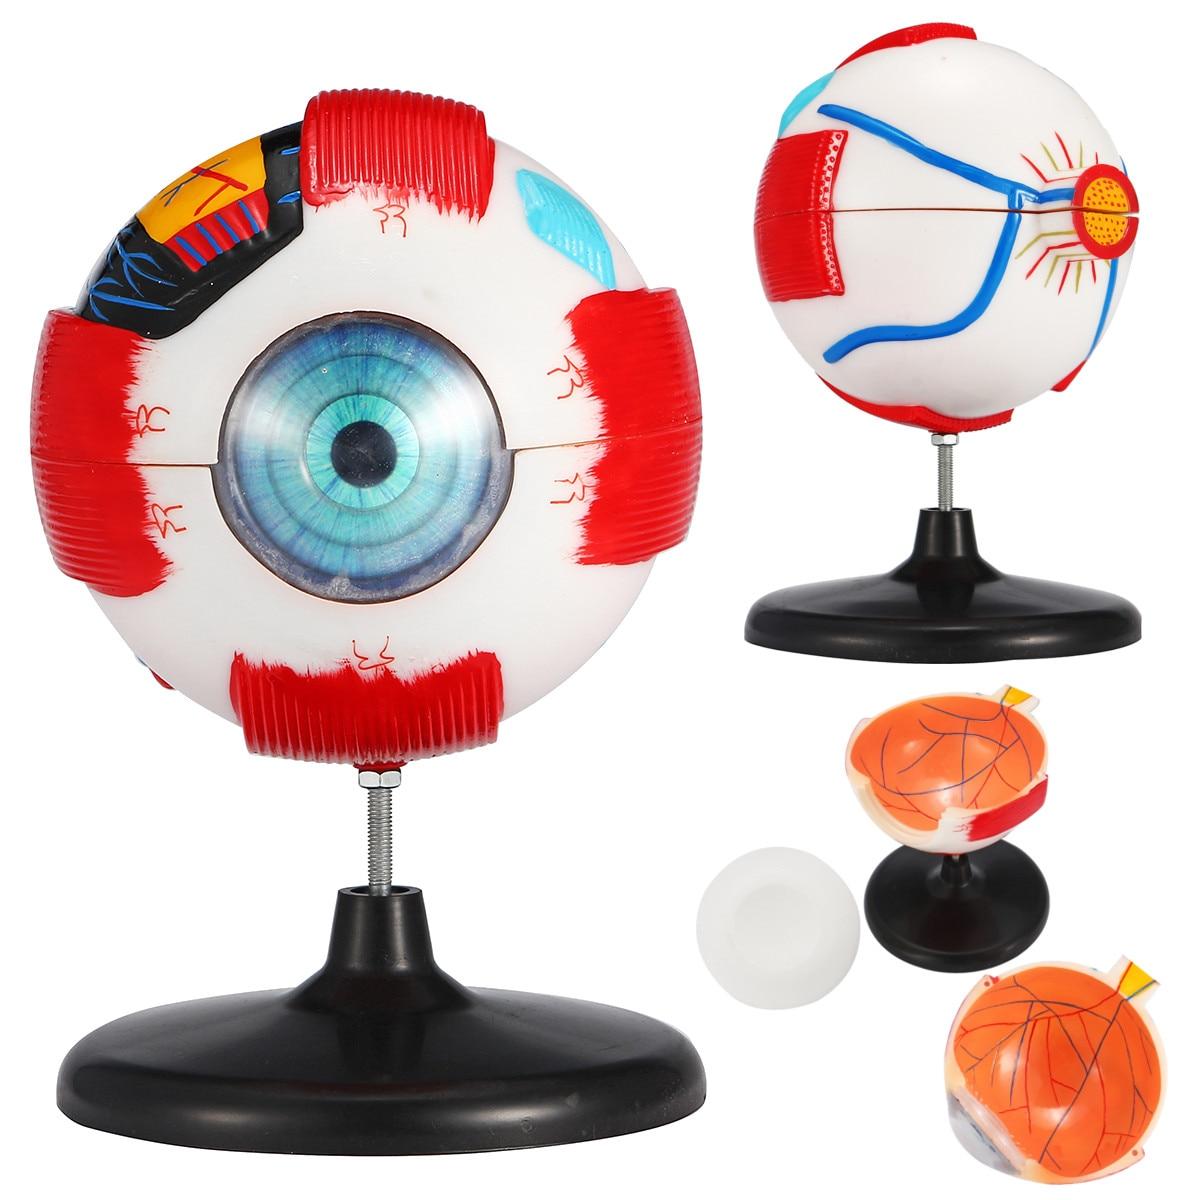 6x Removable Human Eye Eyeball Model Eyeball Internal Structure Learn Human Anatomical Model Lab Teaching Education Specimens|Medical Science| |  - title=